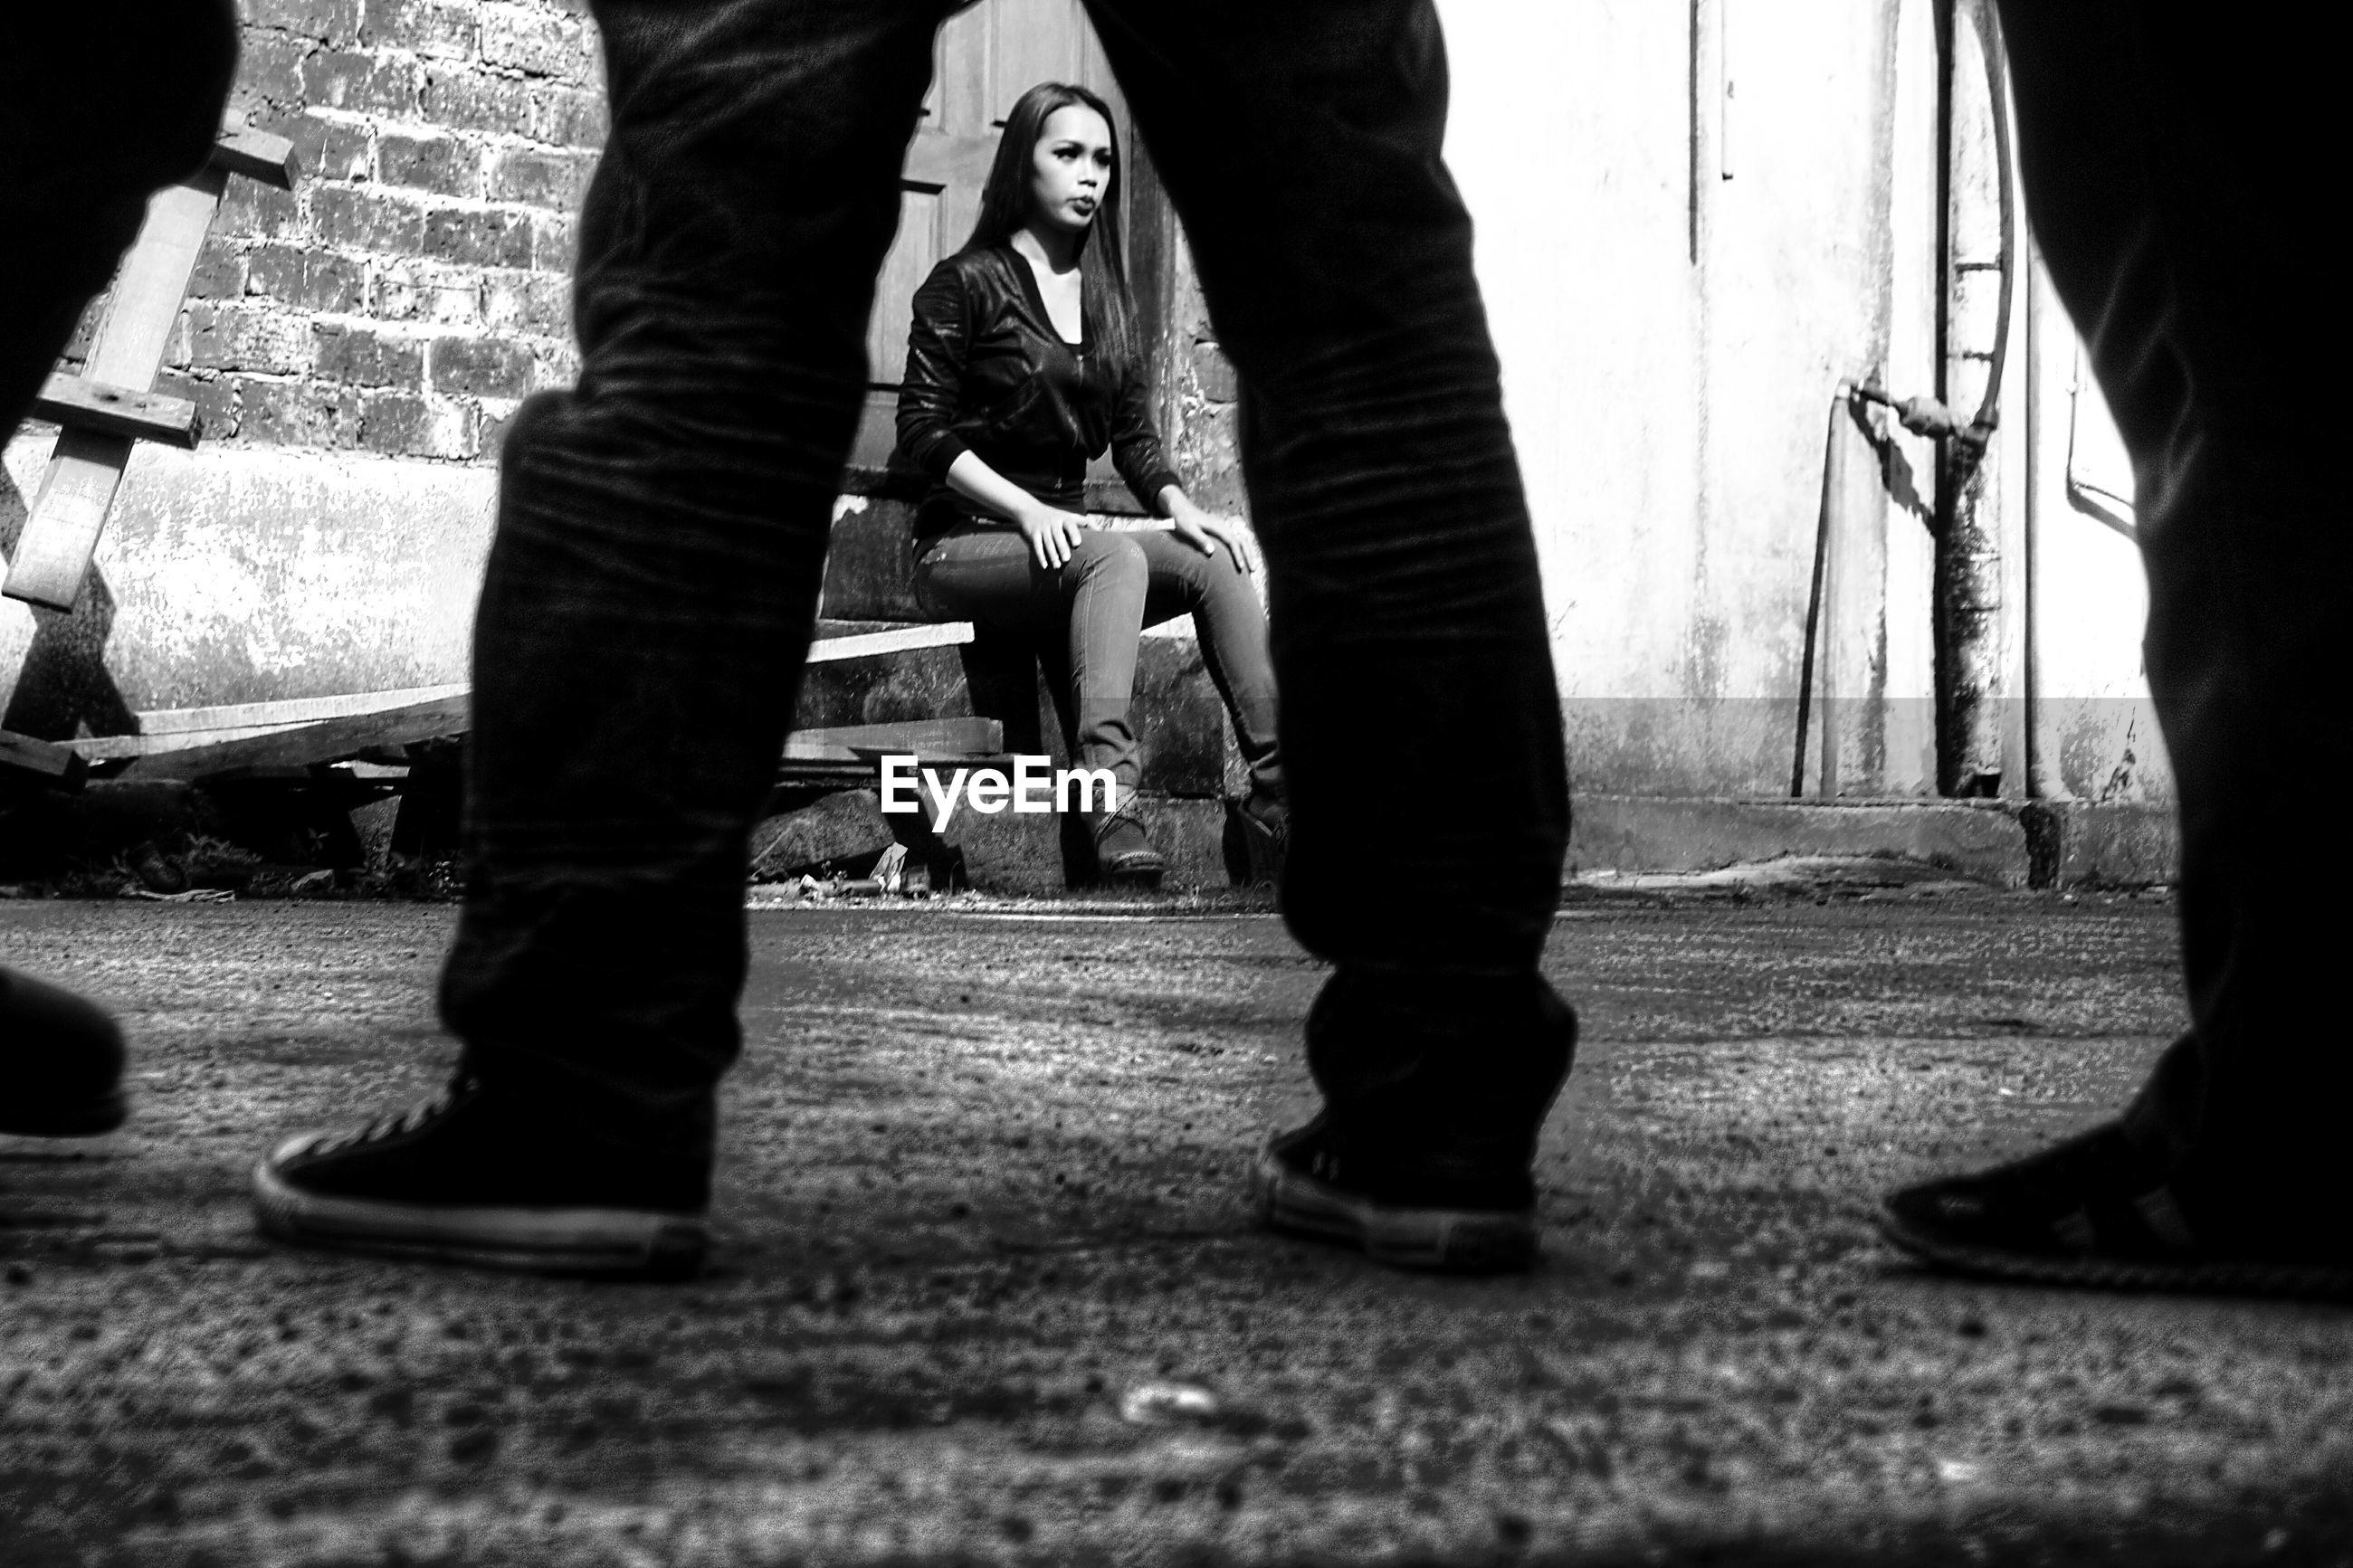 Woman sitting on steps seen through legs